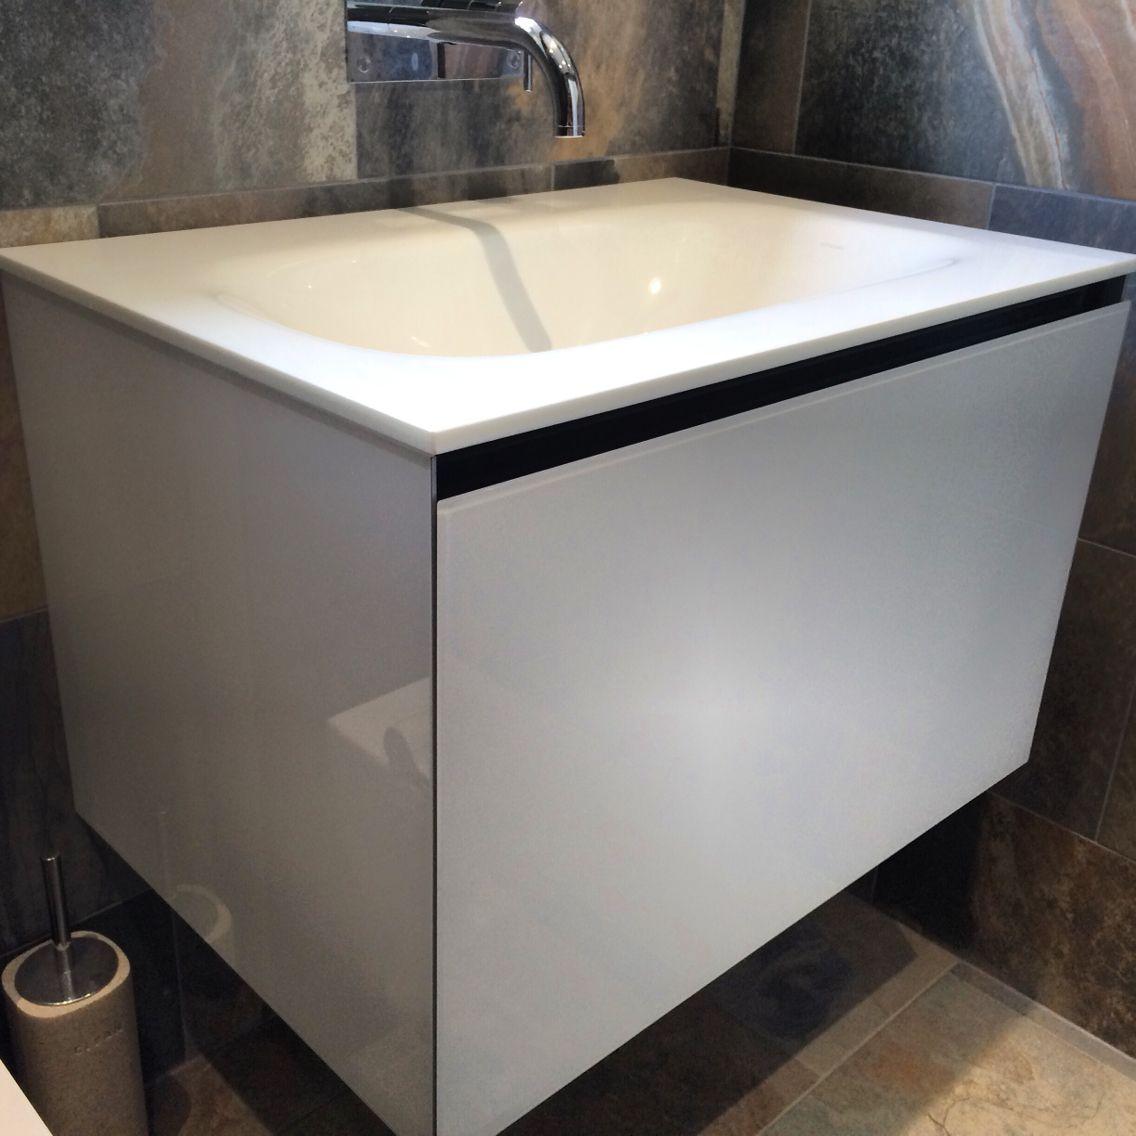 Tapis Salle De Bain Vinyl ~ Artelinea Domino 75 Basin Installed By Aquanero Bathroom Design